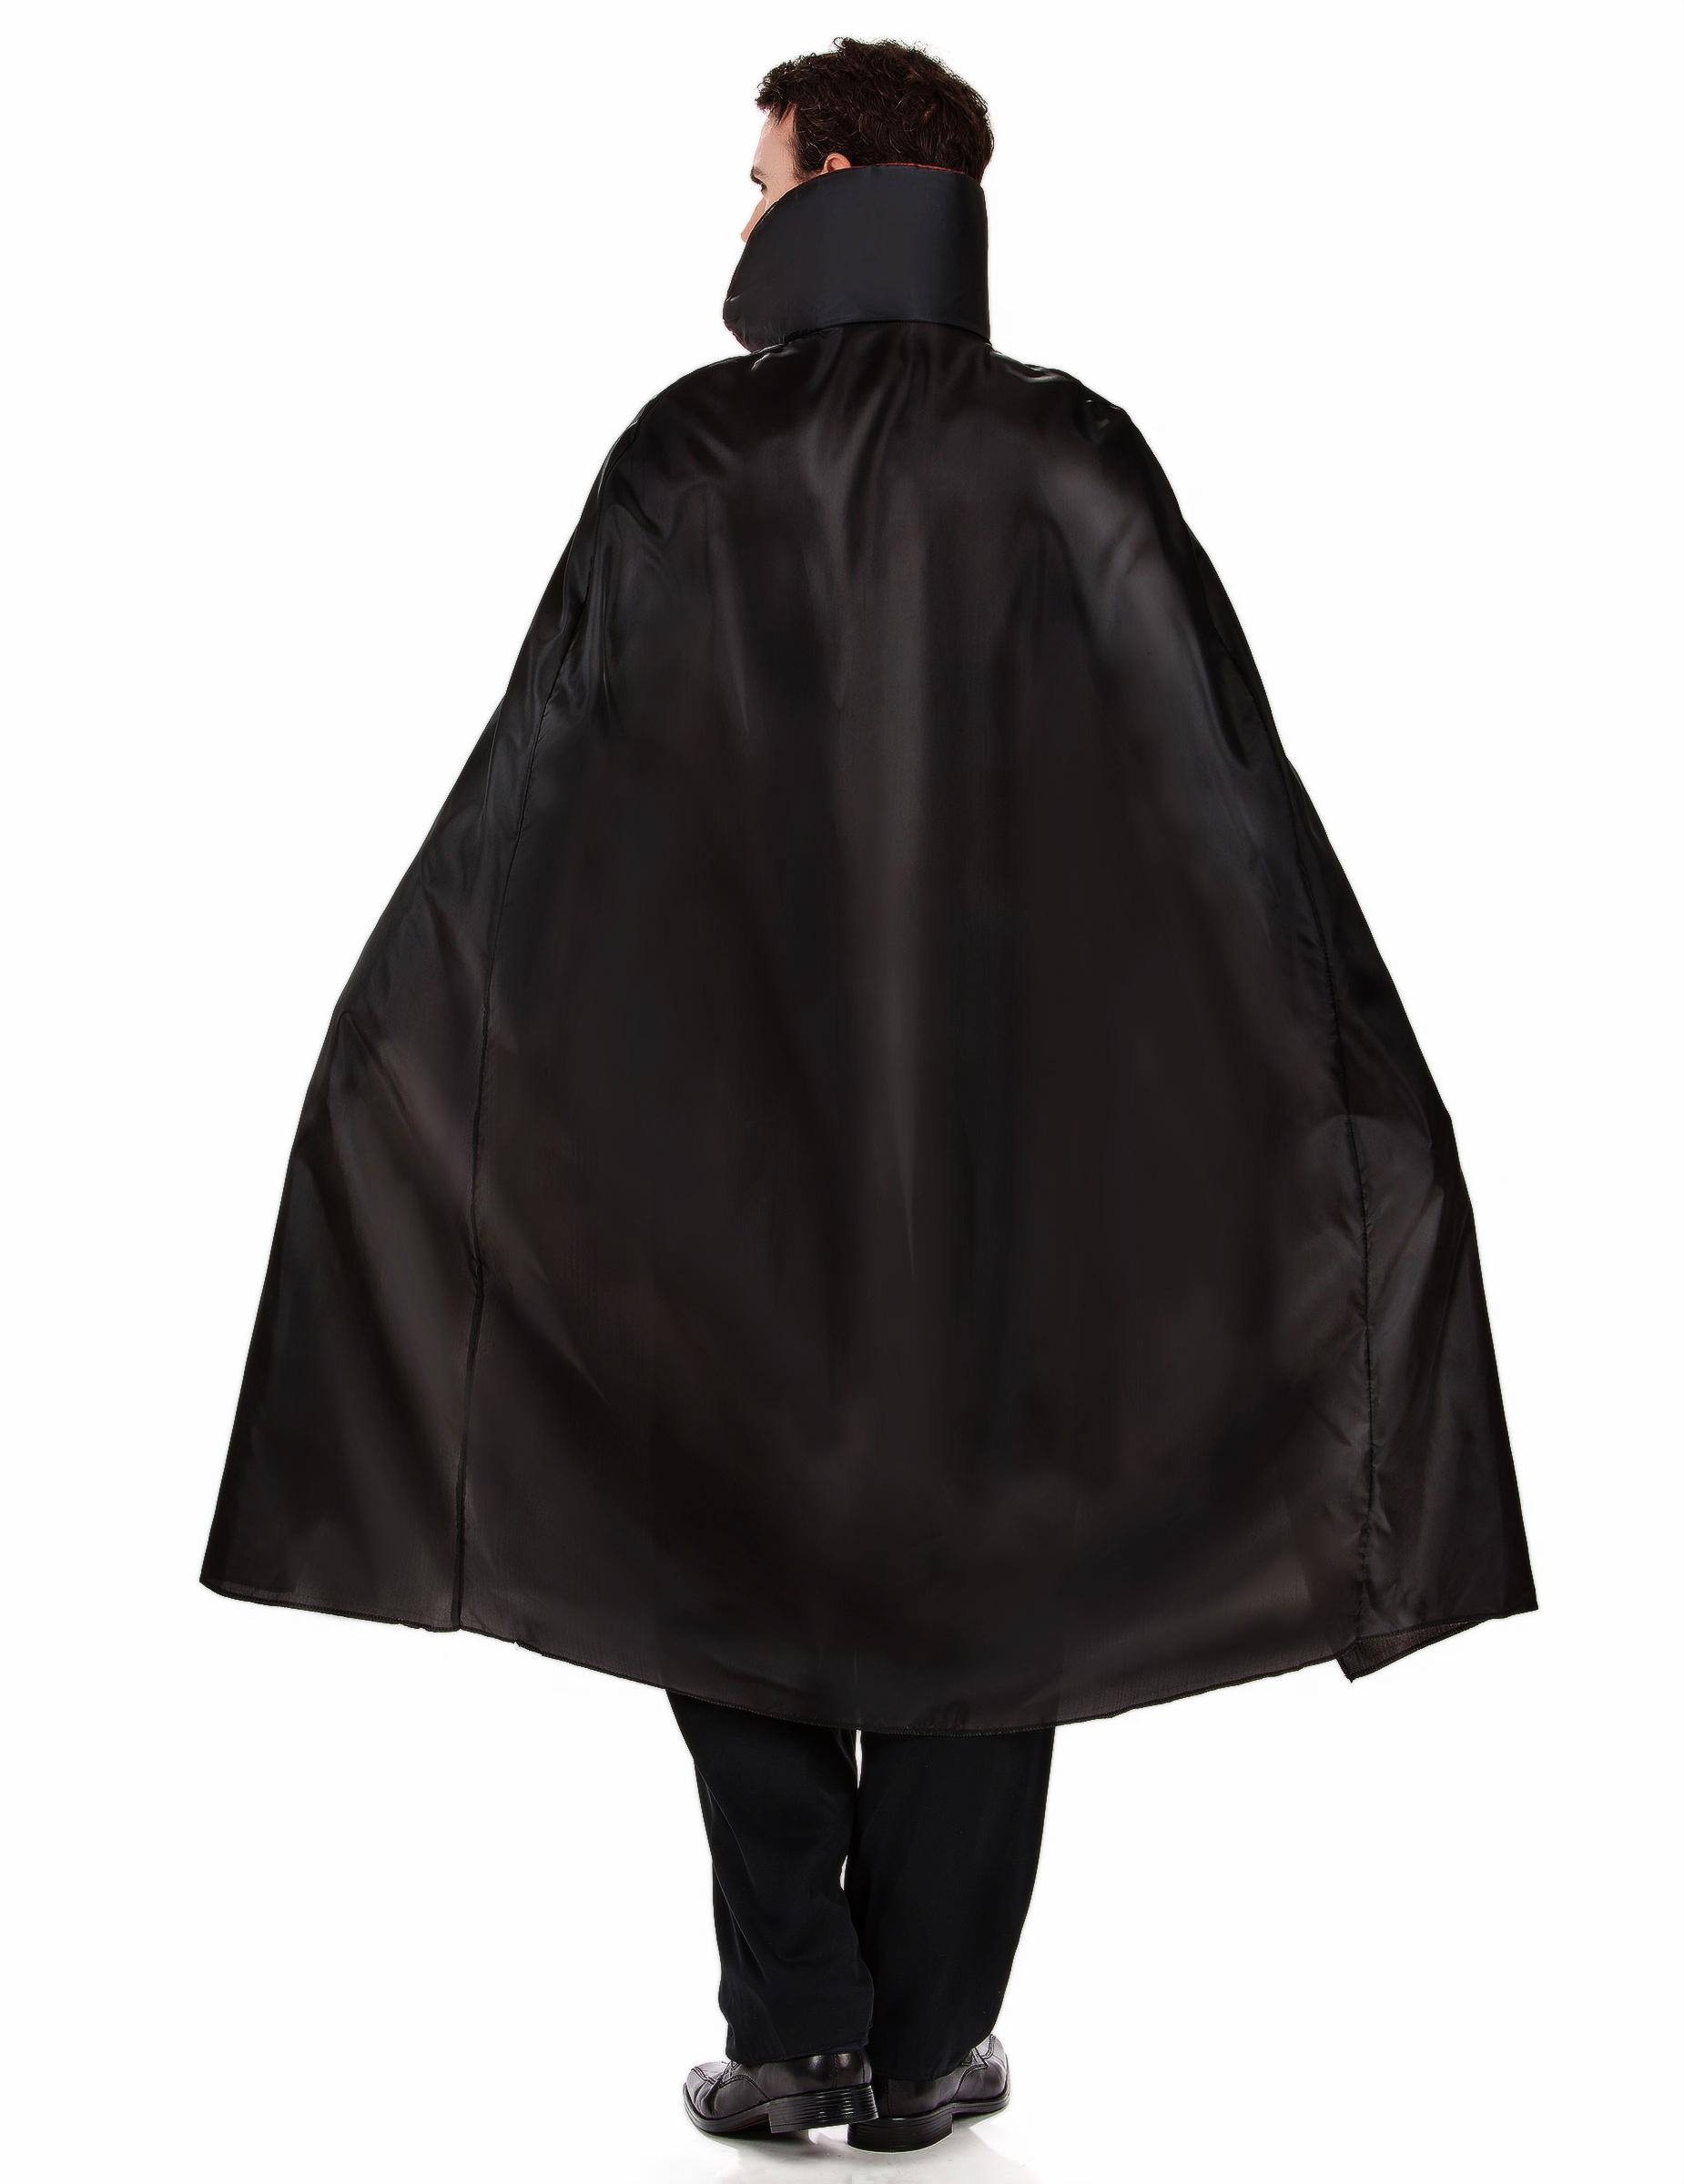 Vampir Kostüm für Herren Blutsauger Halloweenkostüm schwarz bordeaux